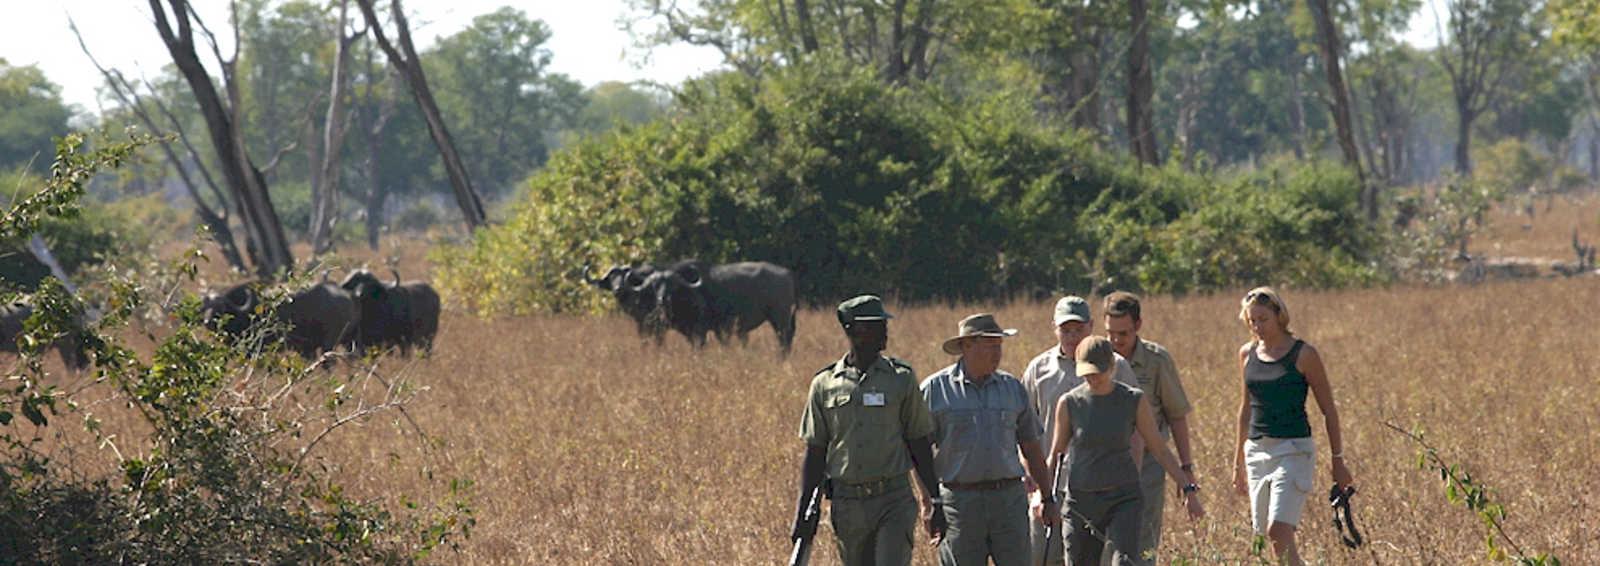 Walking Safari, South Luangwa, Zambia